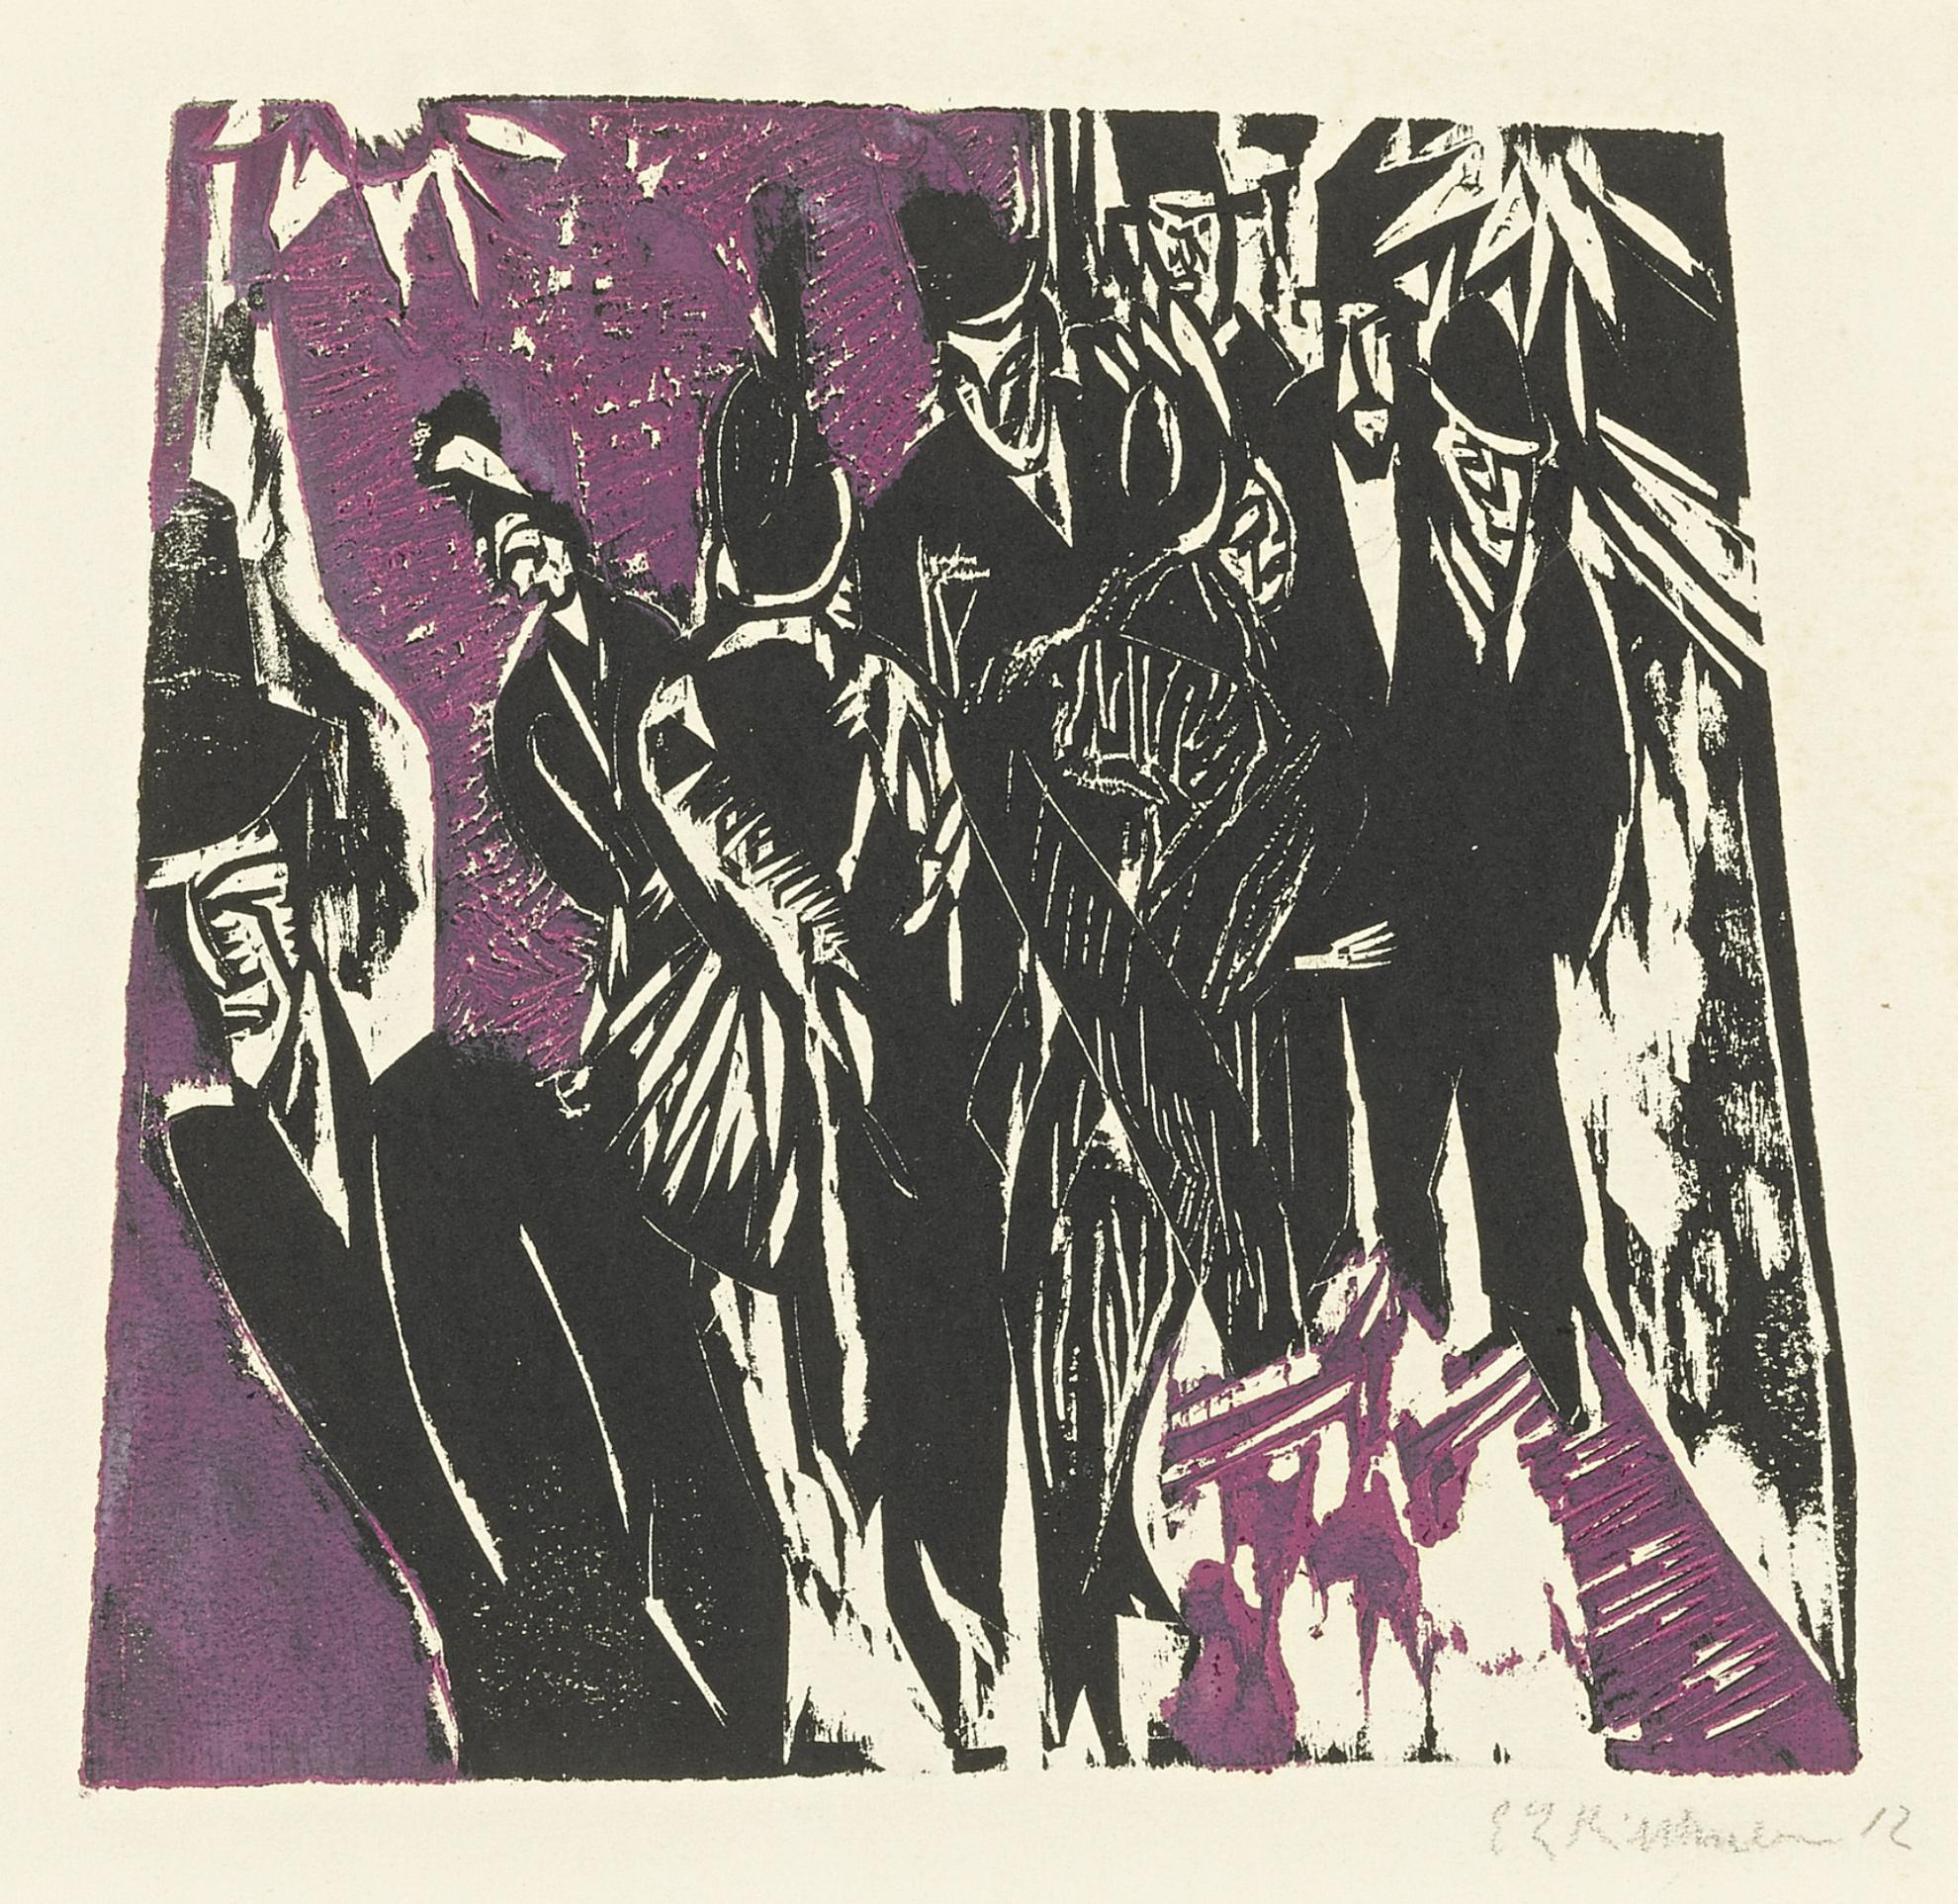 Ernst Ludwig Kirchner-Strassenszene (D. H235/B; Sch. H218; G. 643/2)-1914